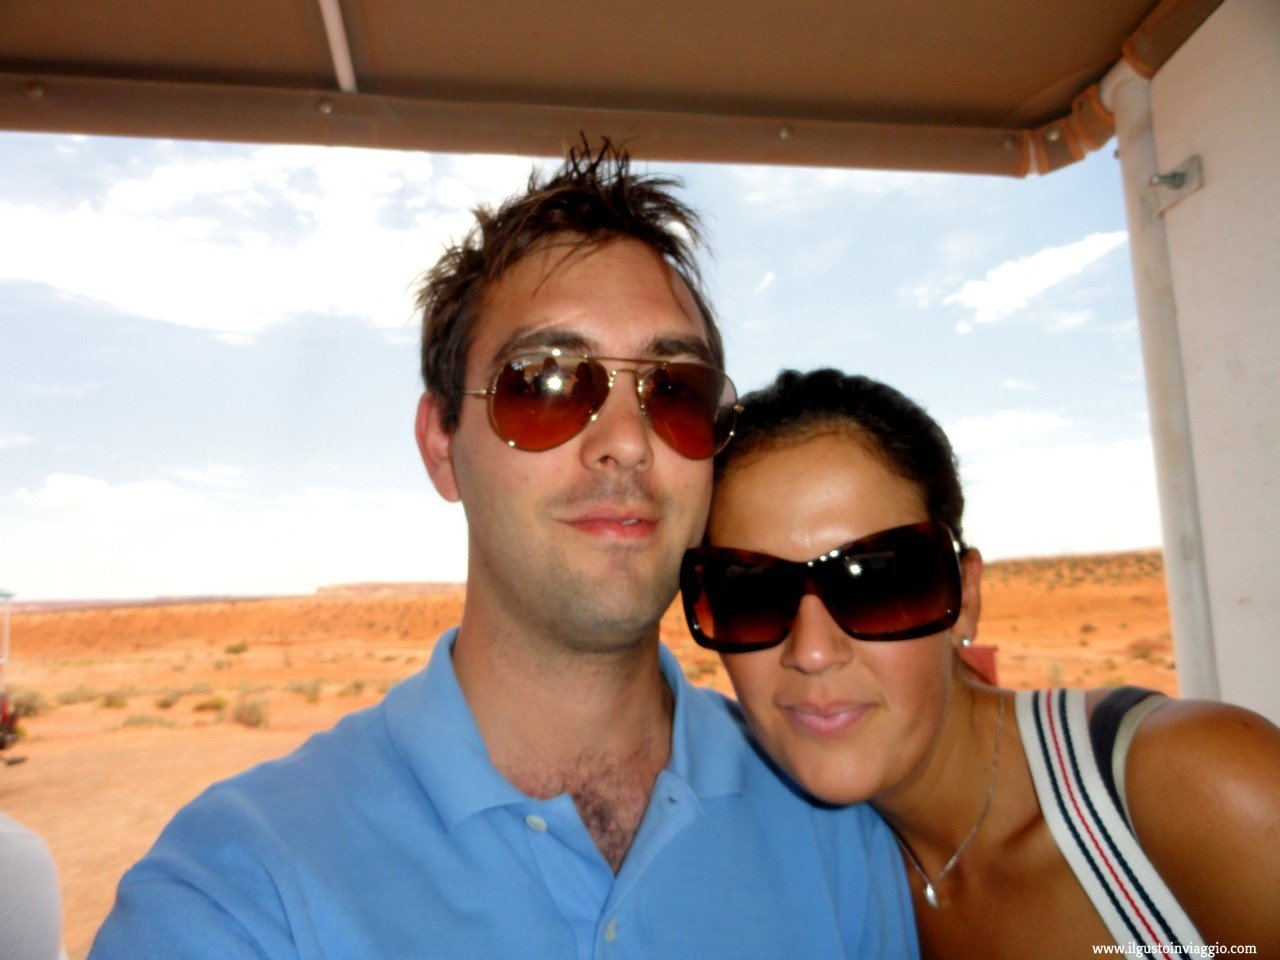 tour antelope canyon, antelopo canyon, visitare l'upper antelope canyon, arizona